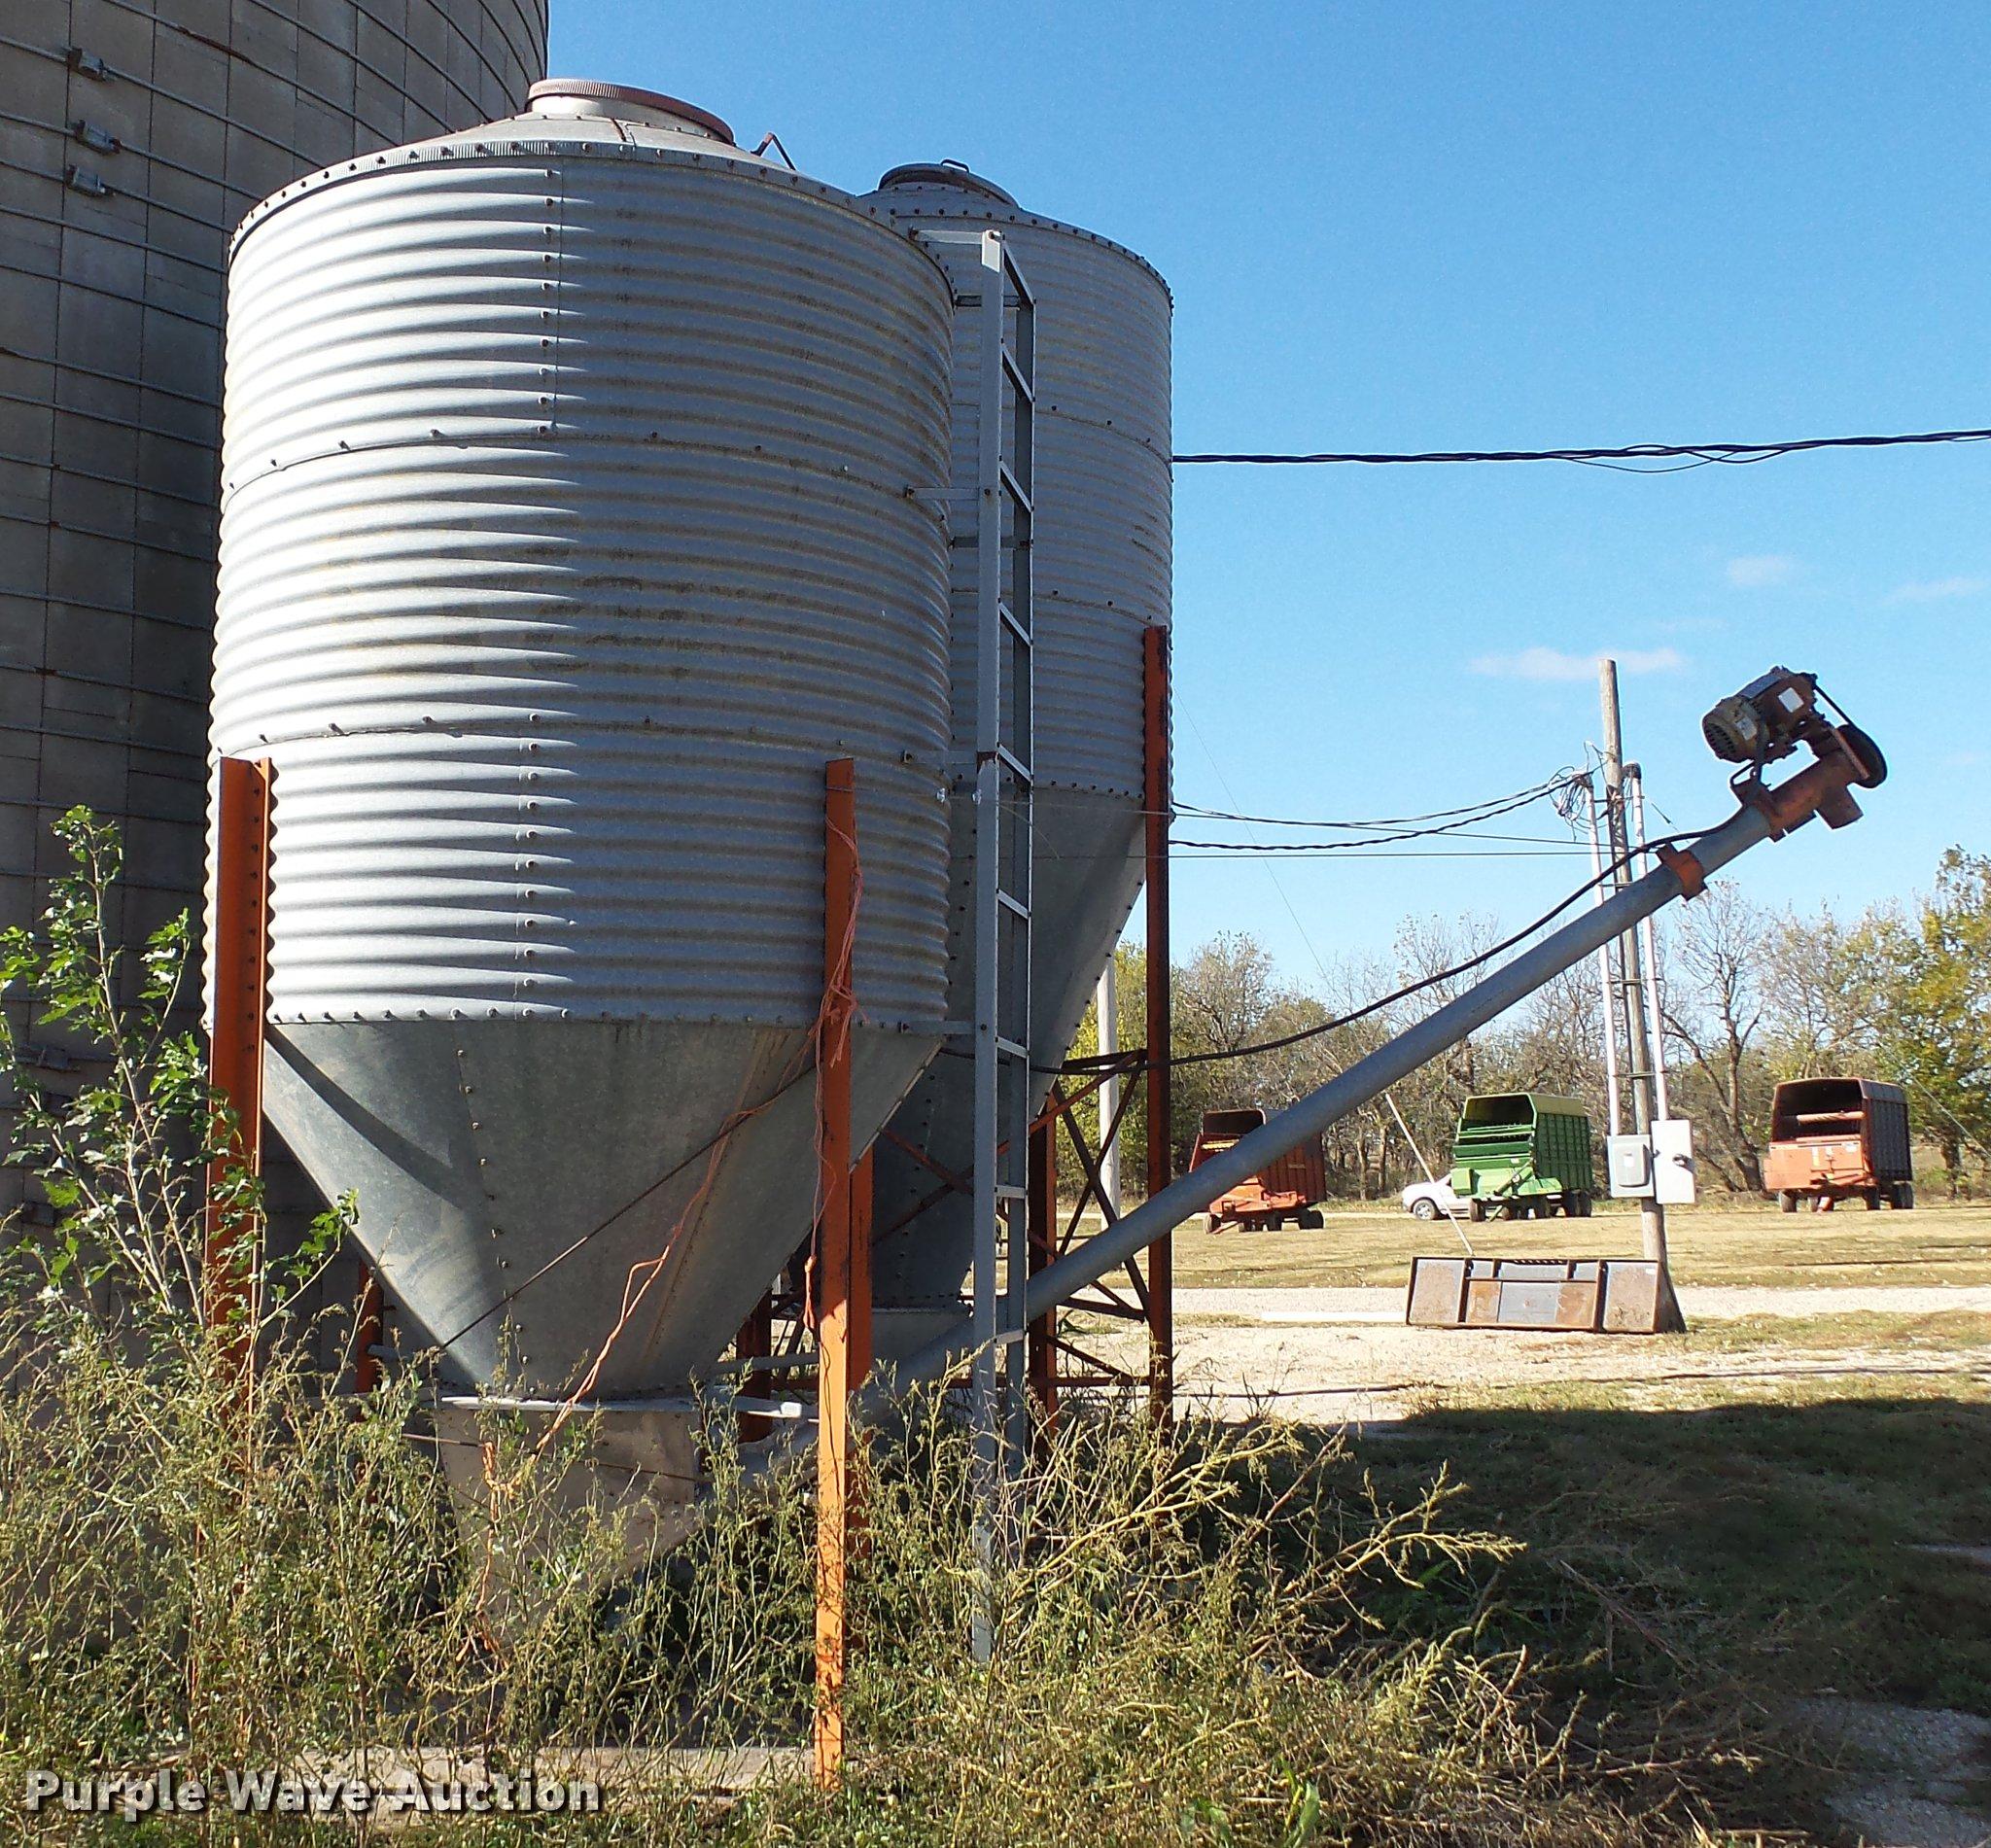 ... Galvanized grain storage bin Full size in new window ... & Galvanized grain storage bin | Item DC1031 | SOLD! December ...